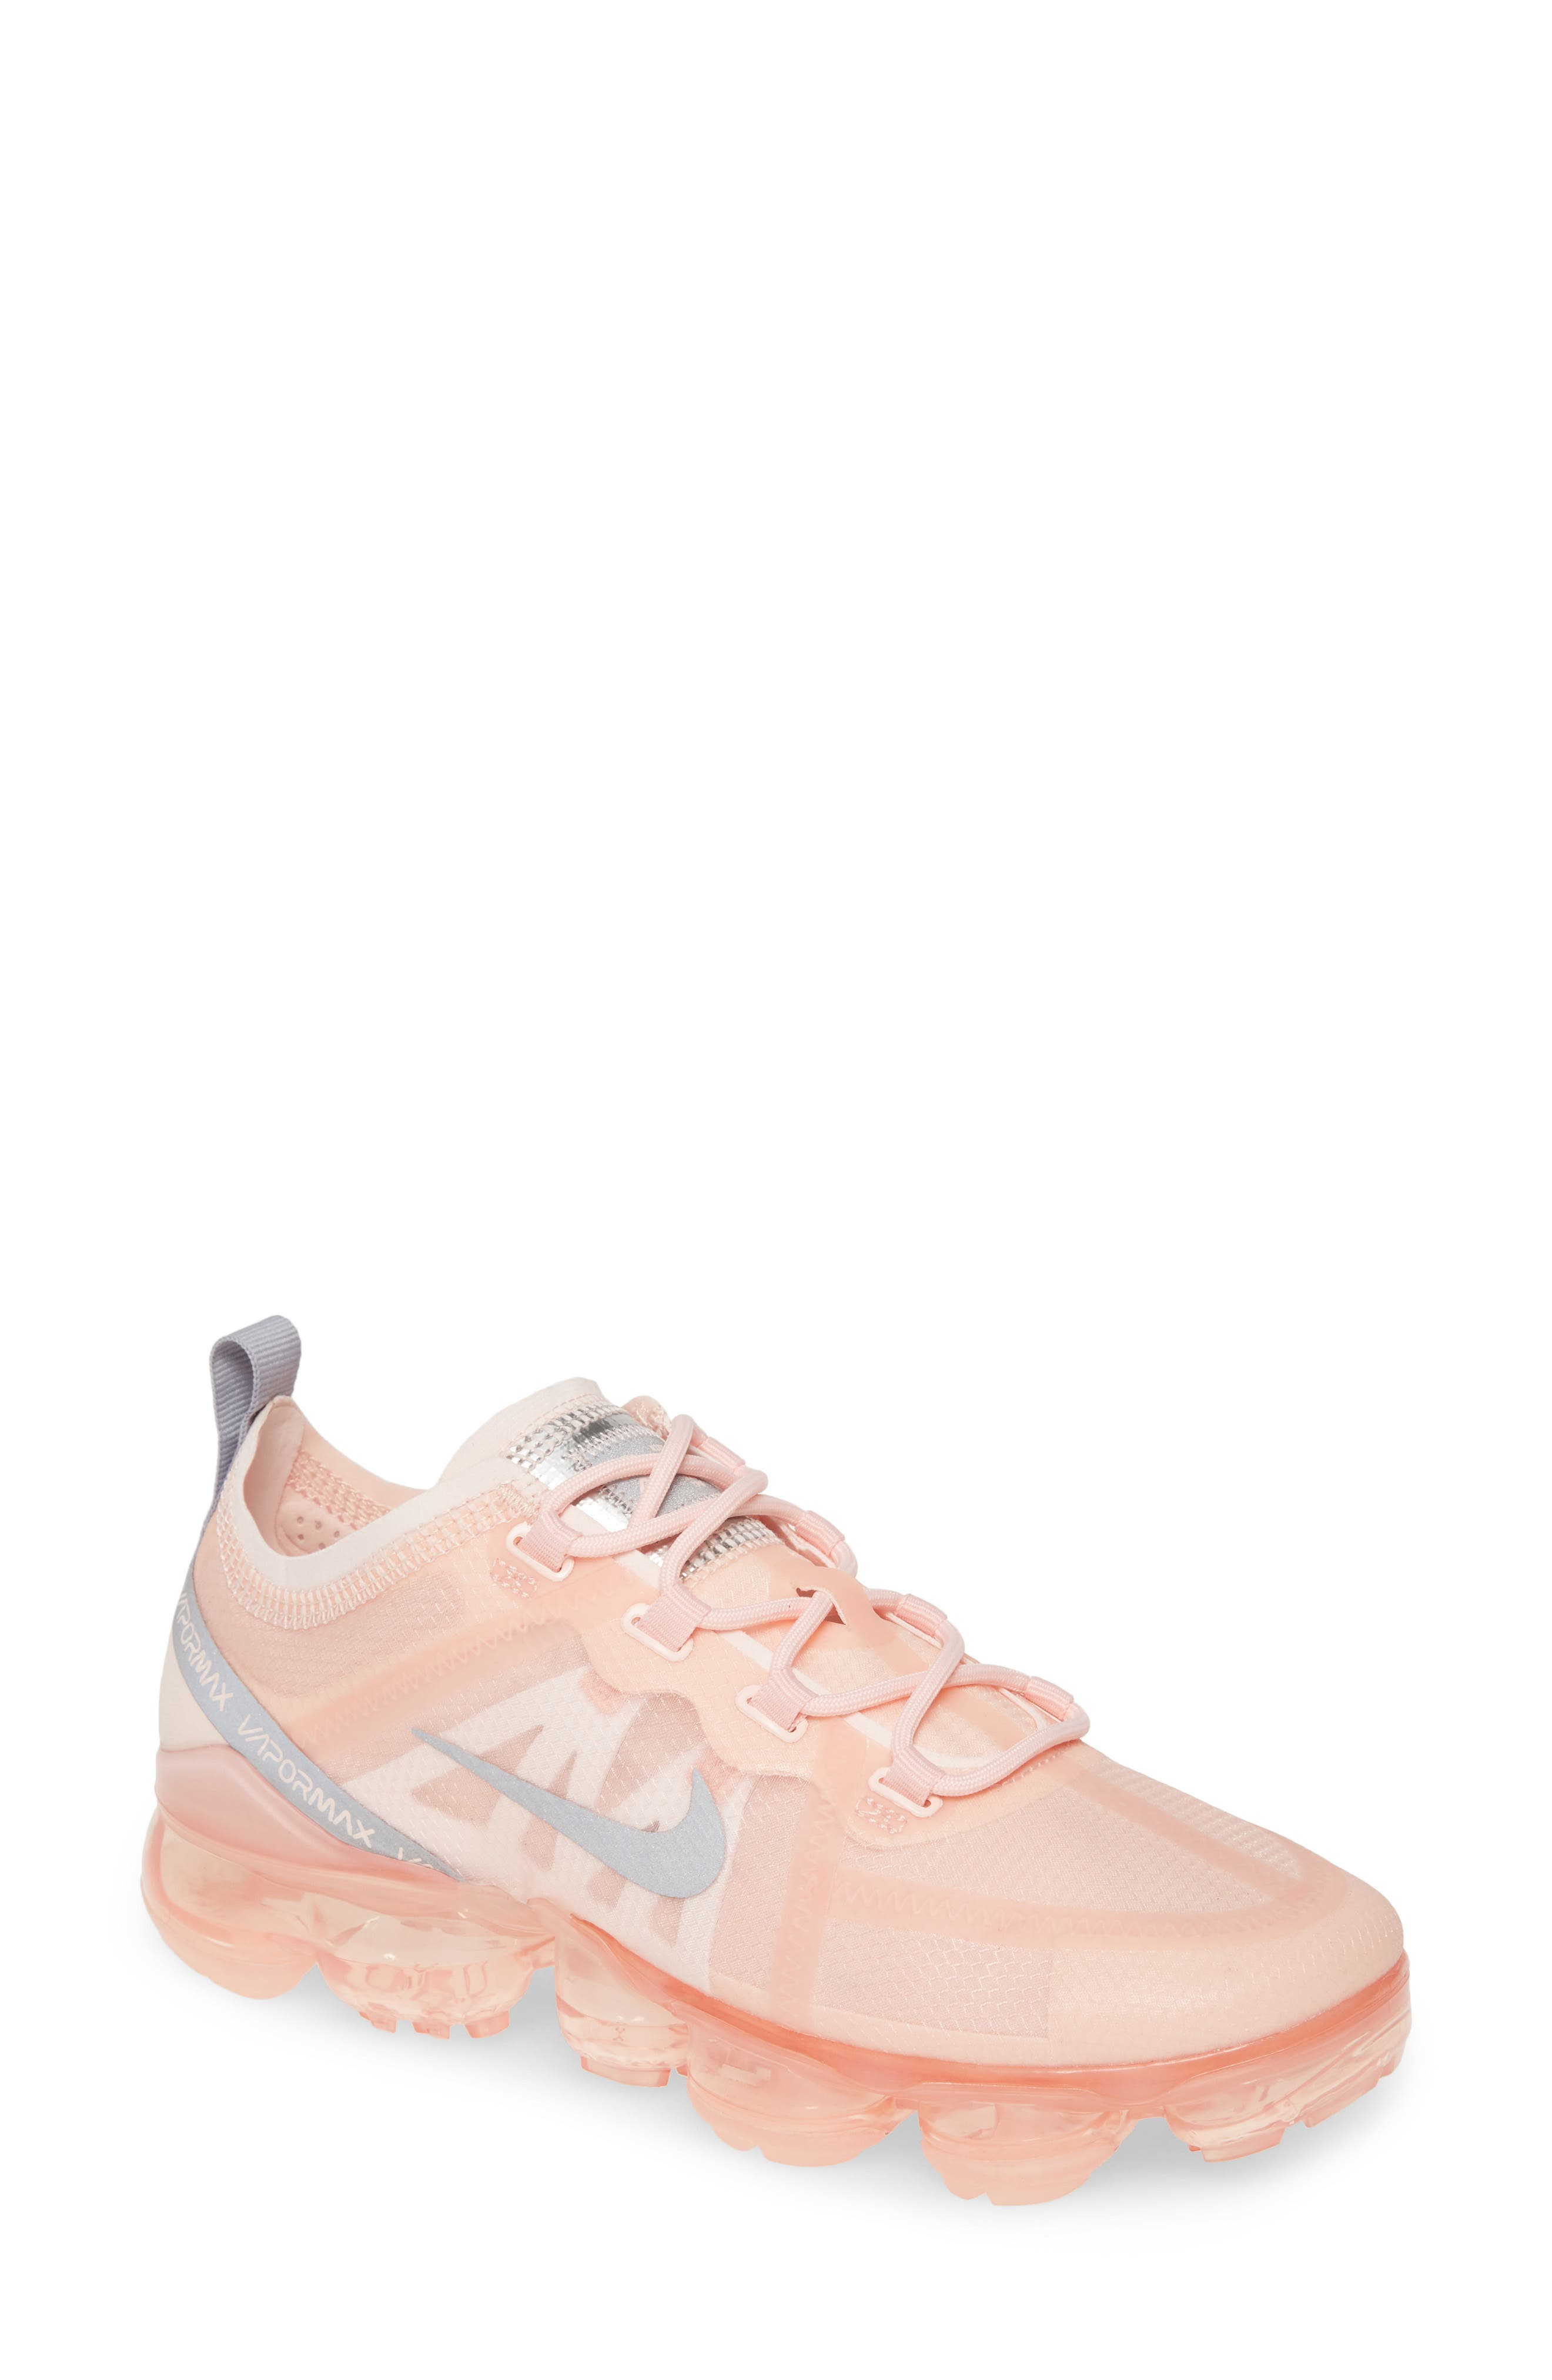 Nike Air Vapormax 2019 Sneaker In Echo